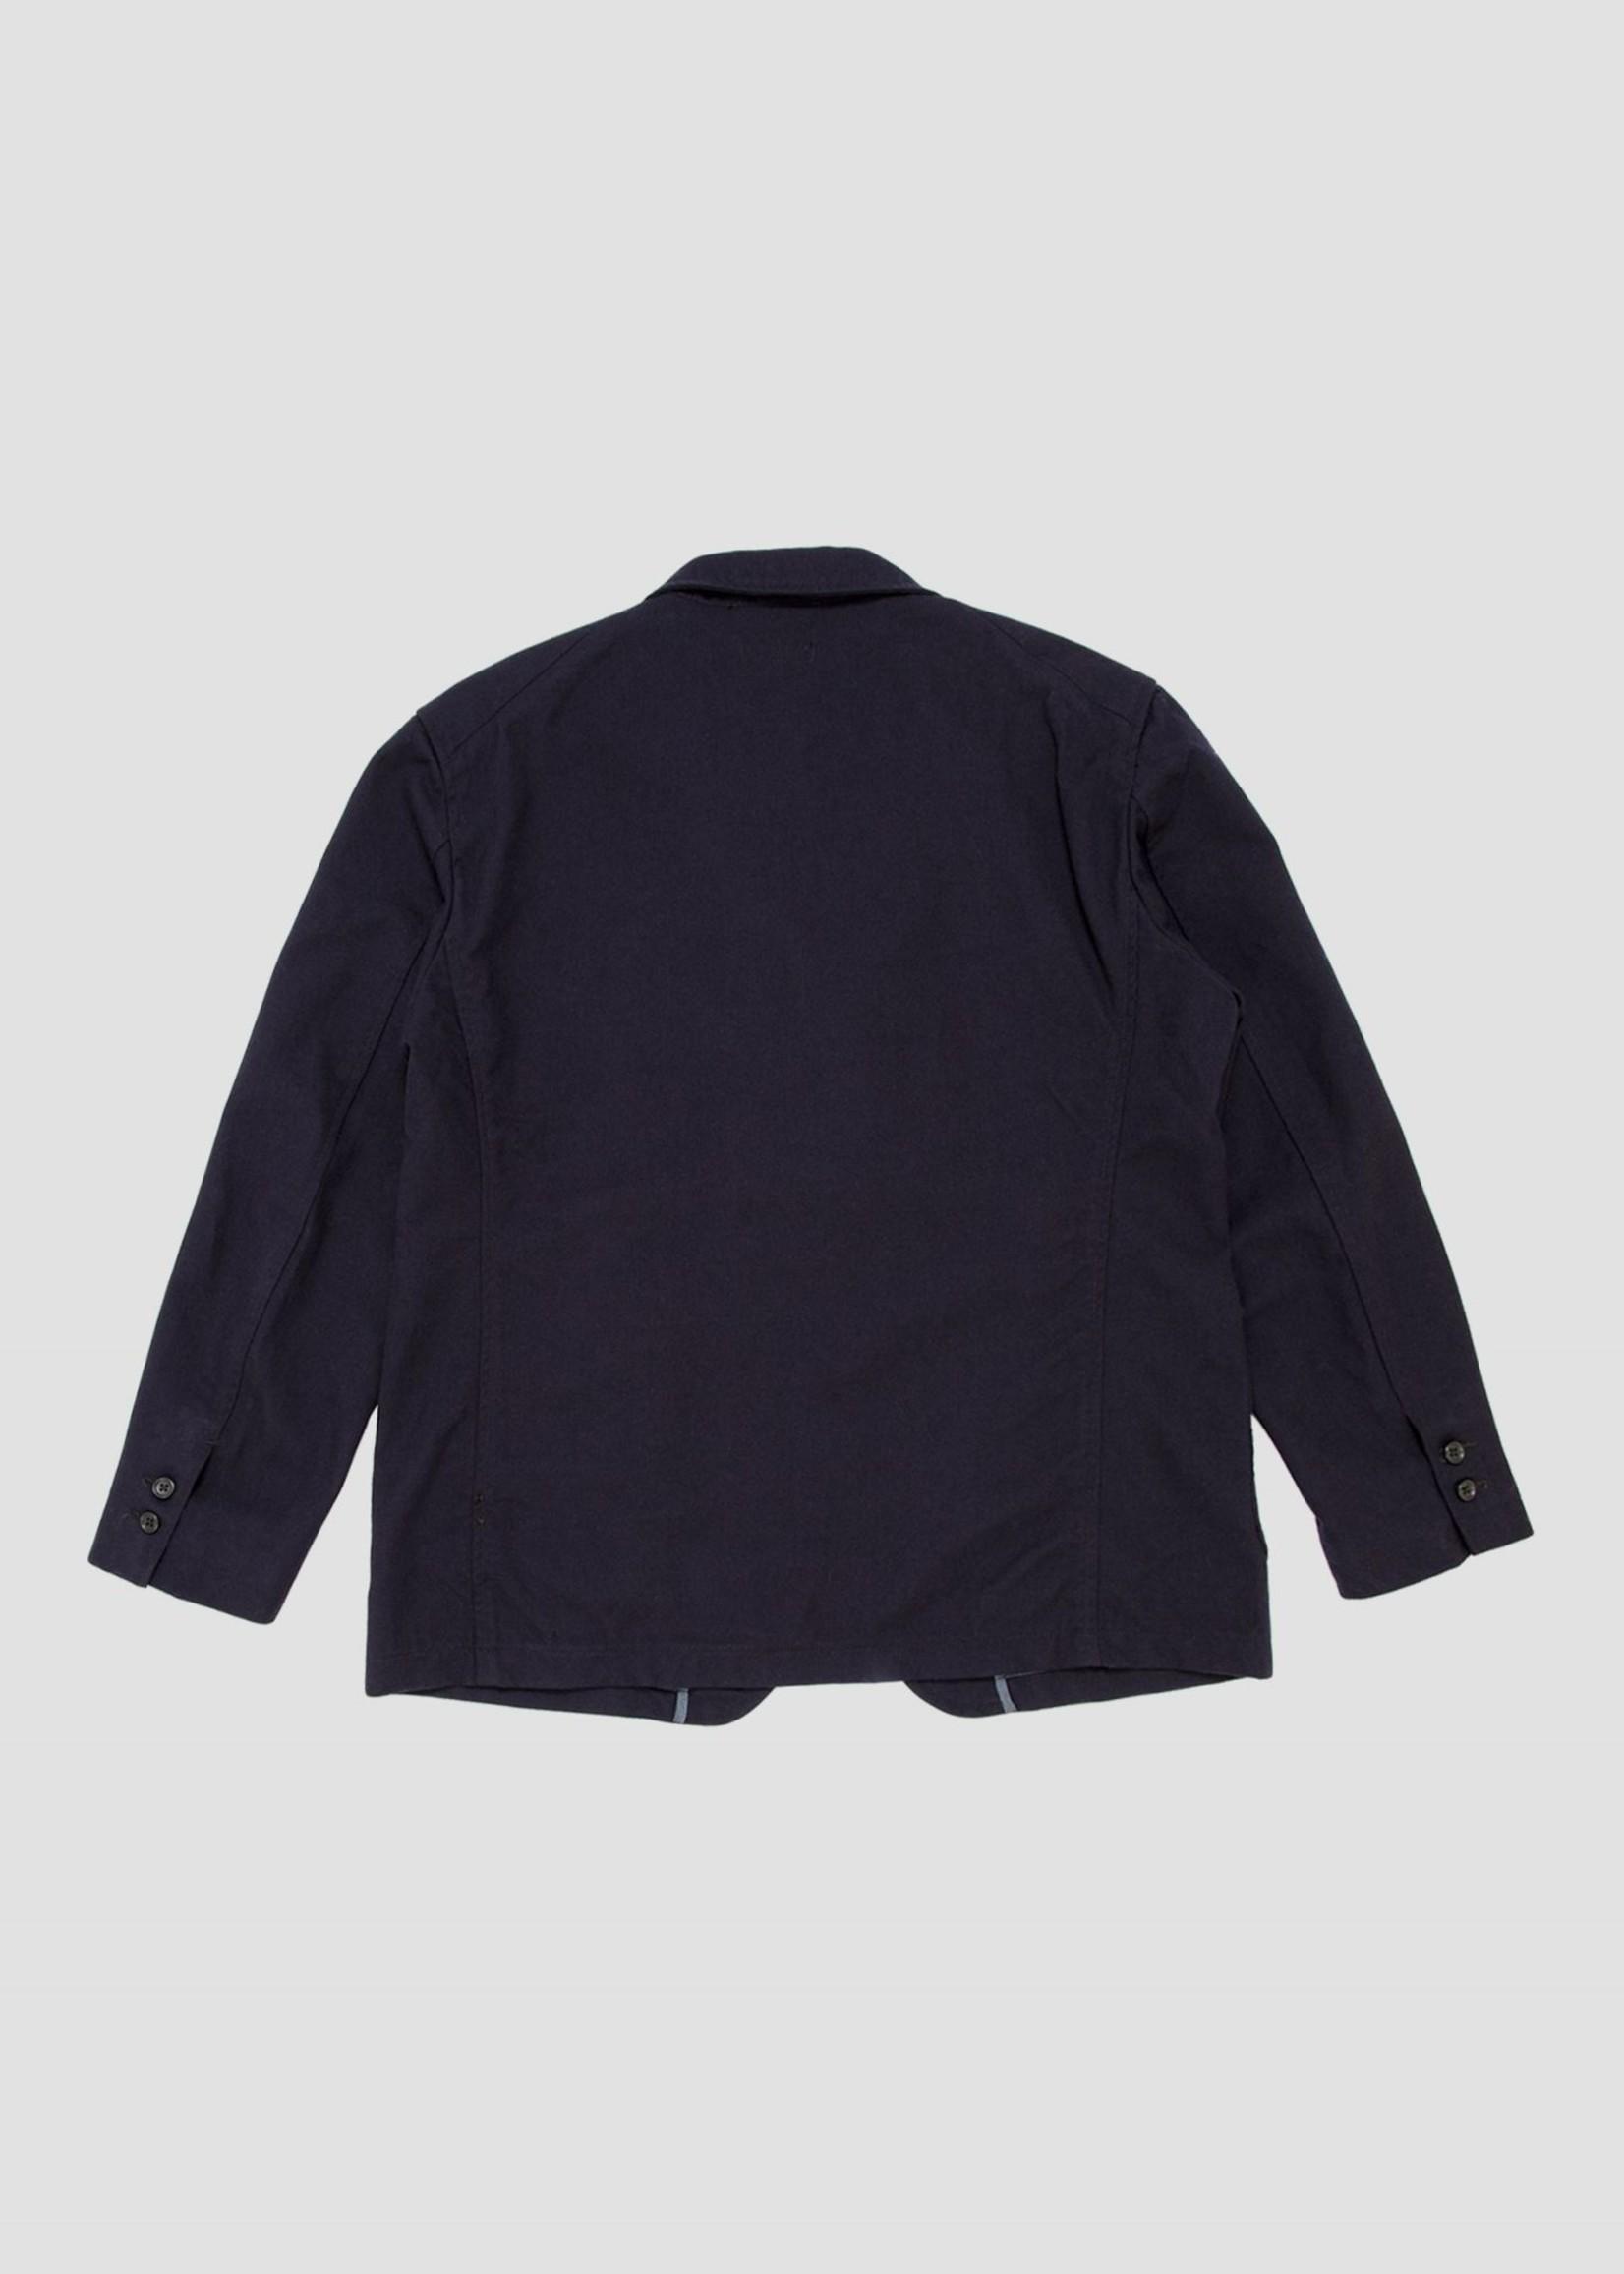 Engineered Garments Engineered Garments New Bedford Jacket Dark Navy / Uniform Serge (21F1D004)